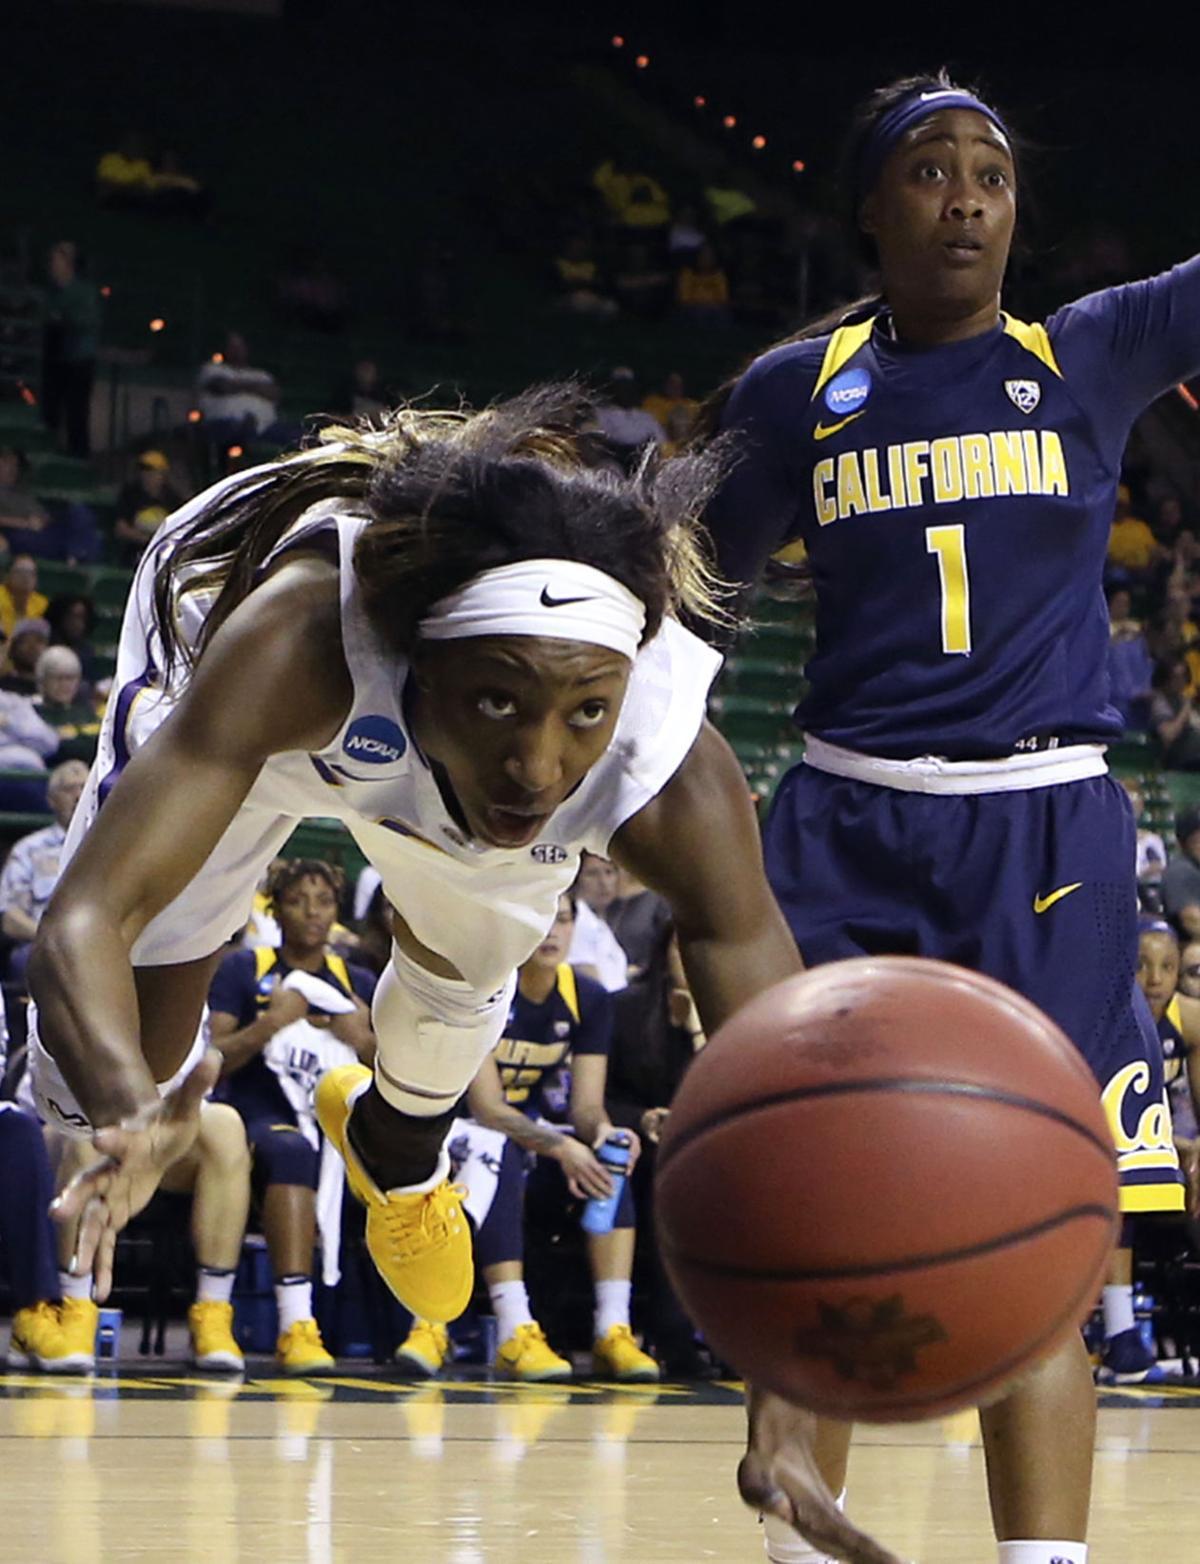 APTOPIX NCAA California LSU Basketball